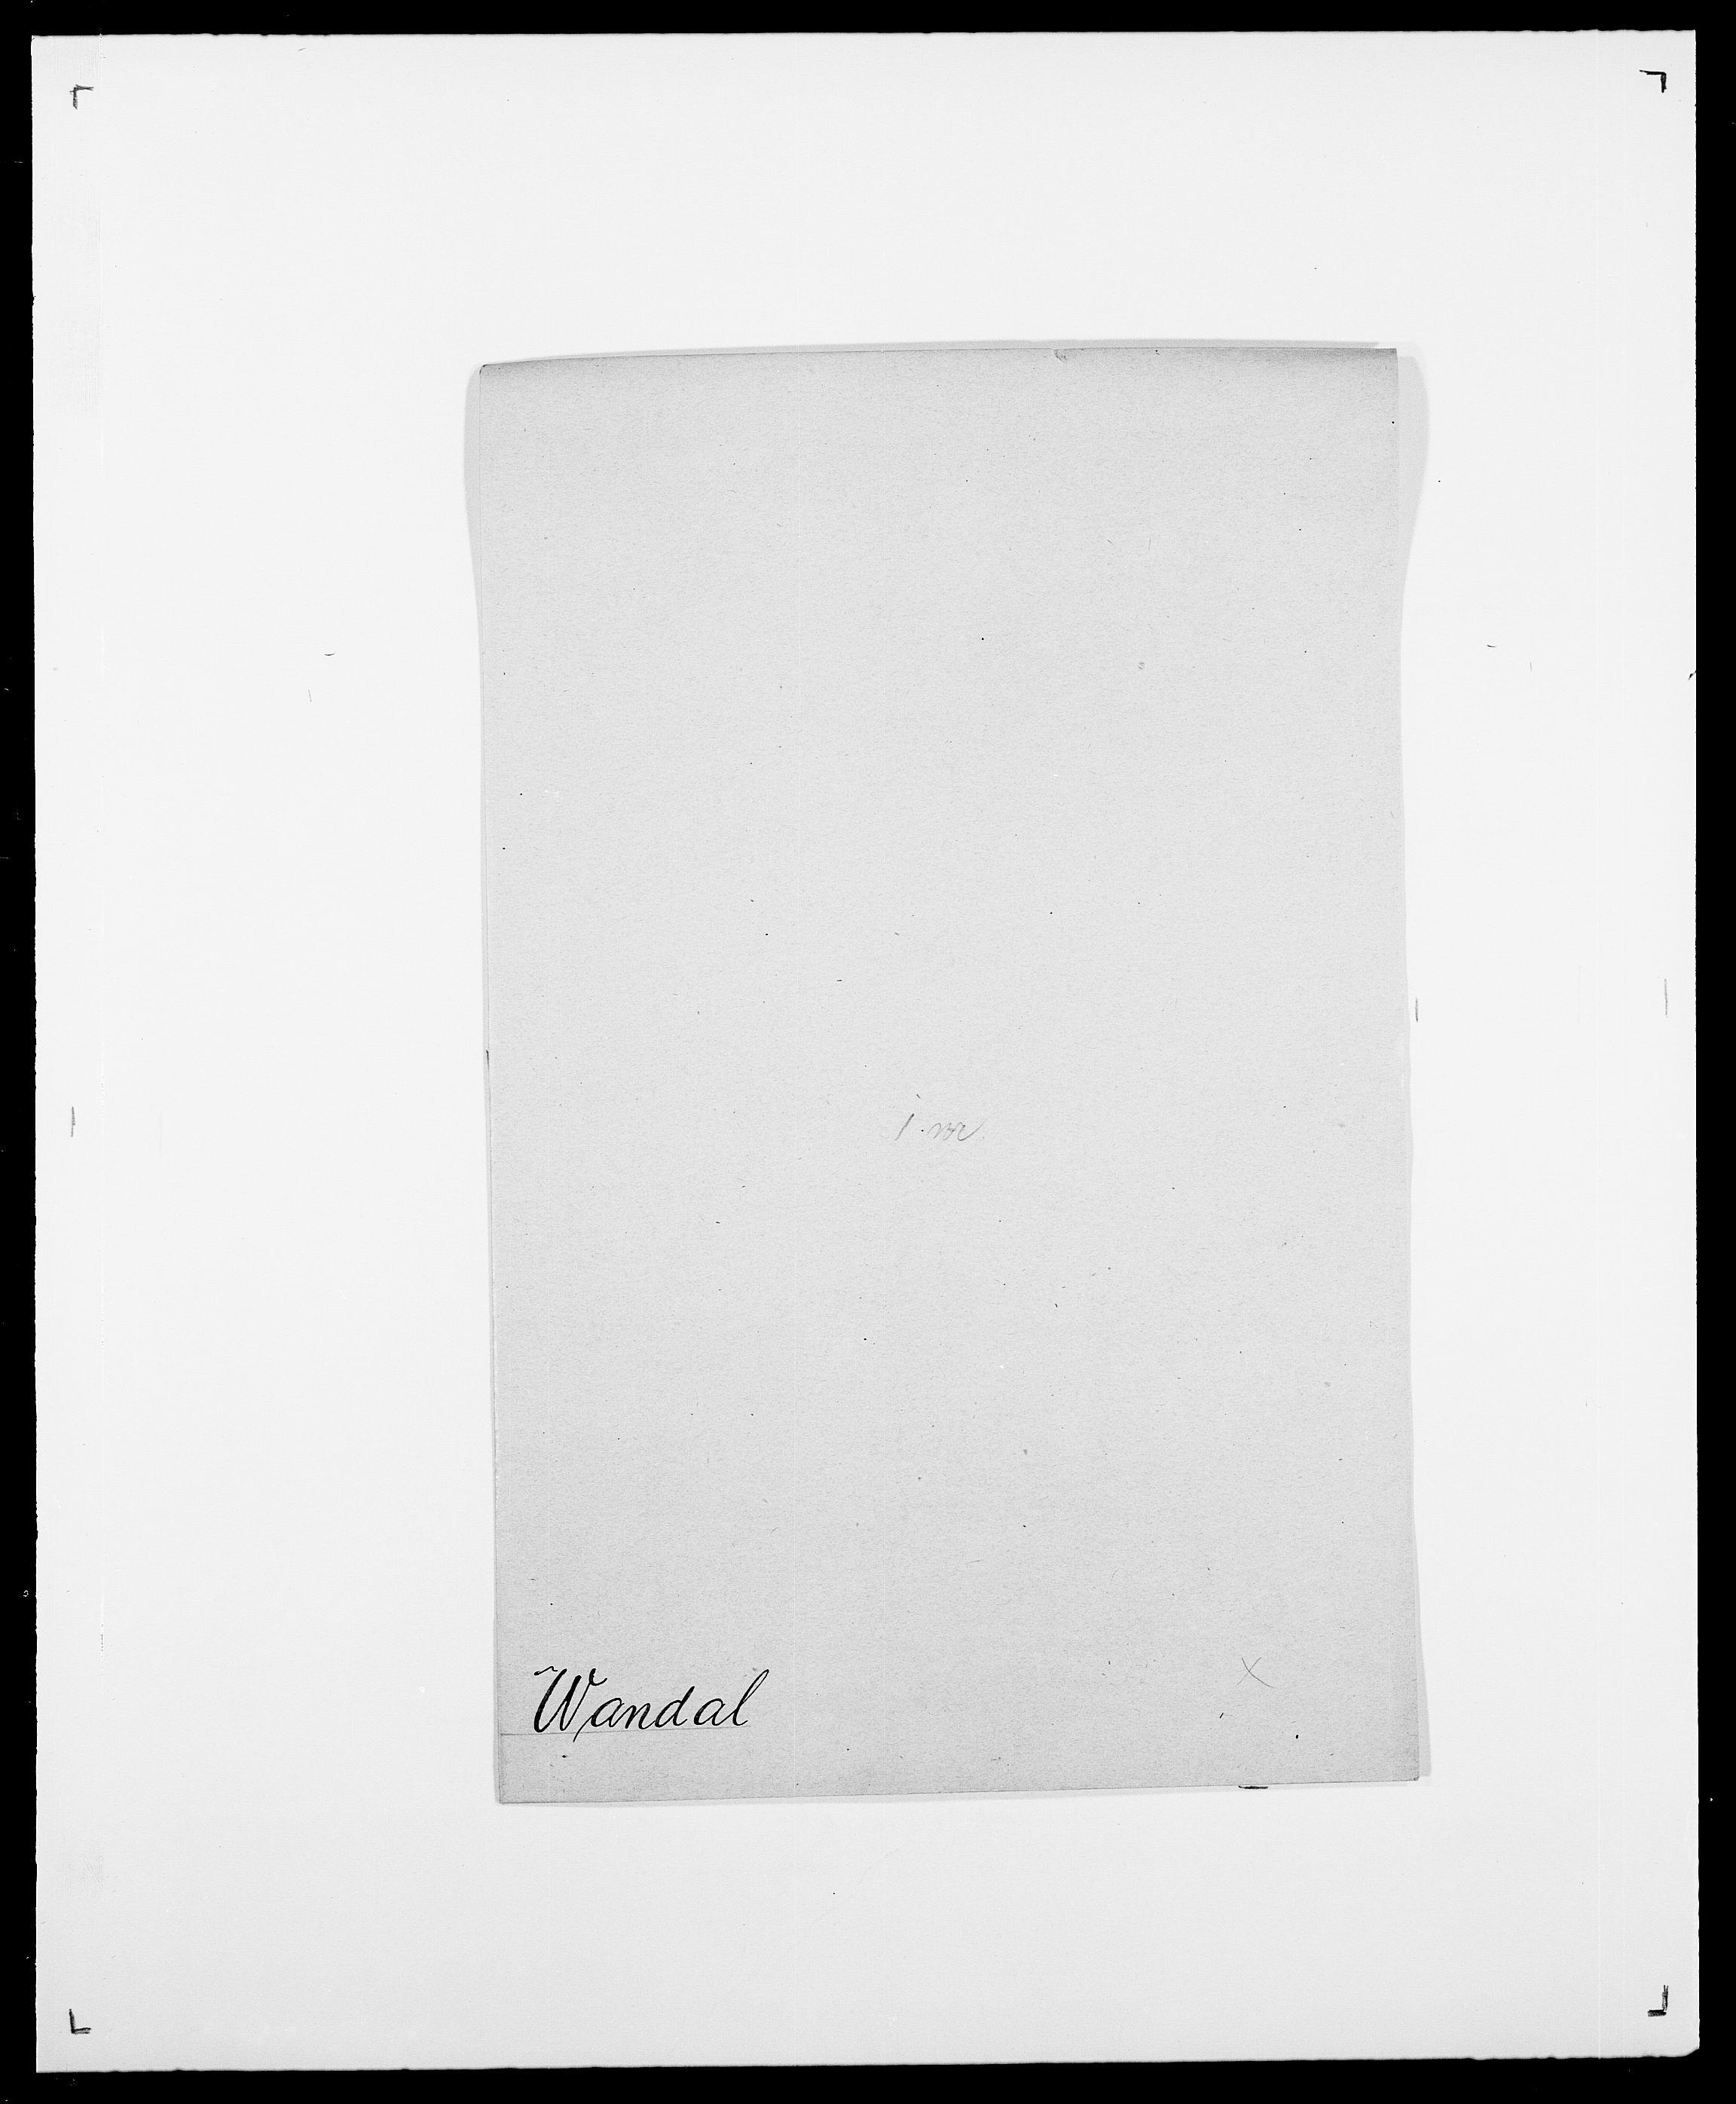 SAO, Delgobe, Charles Antoine - samling, D/Da/L0040: Usgaard - Velund, s. 269